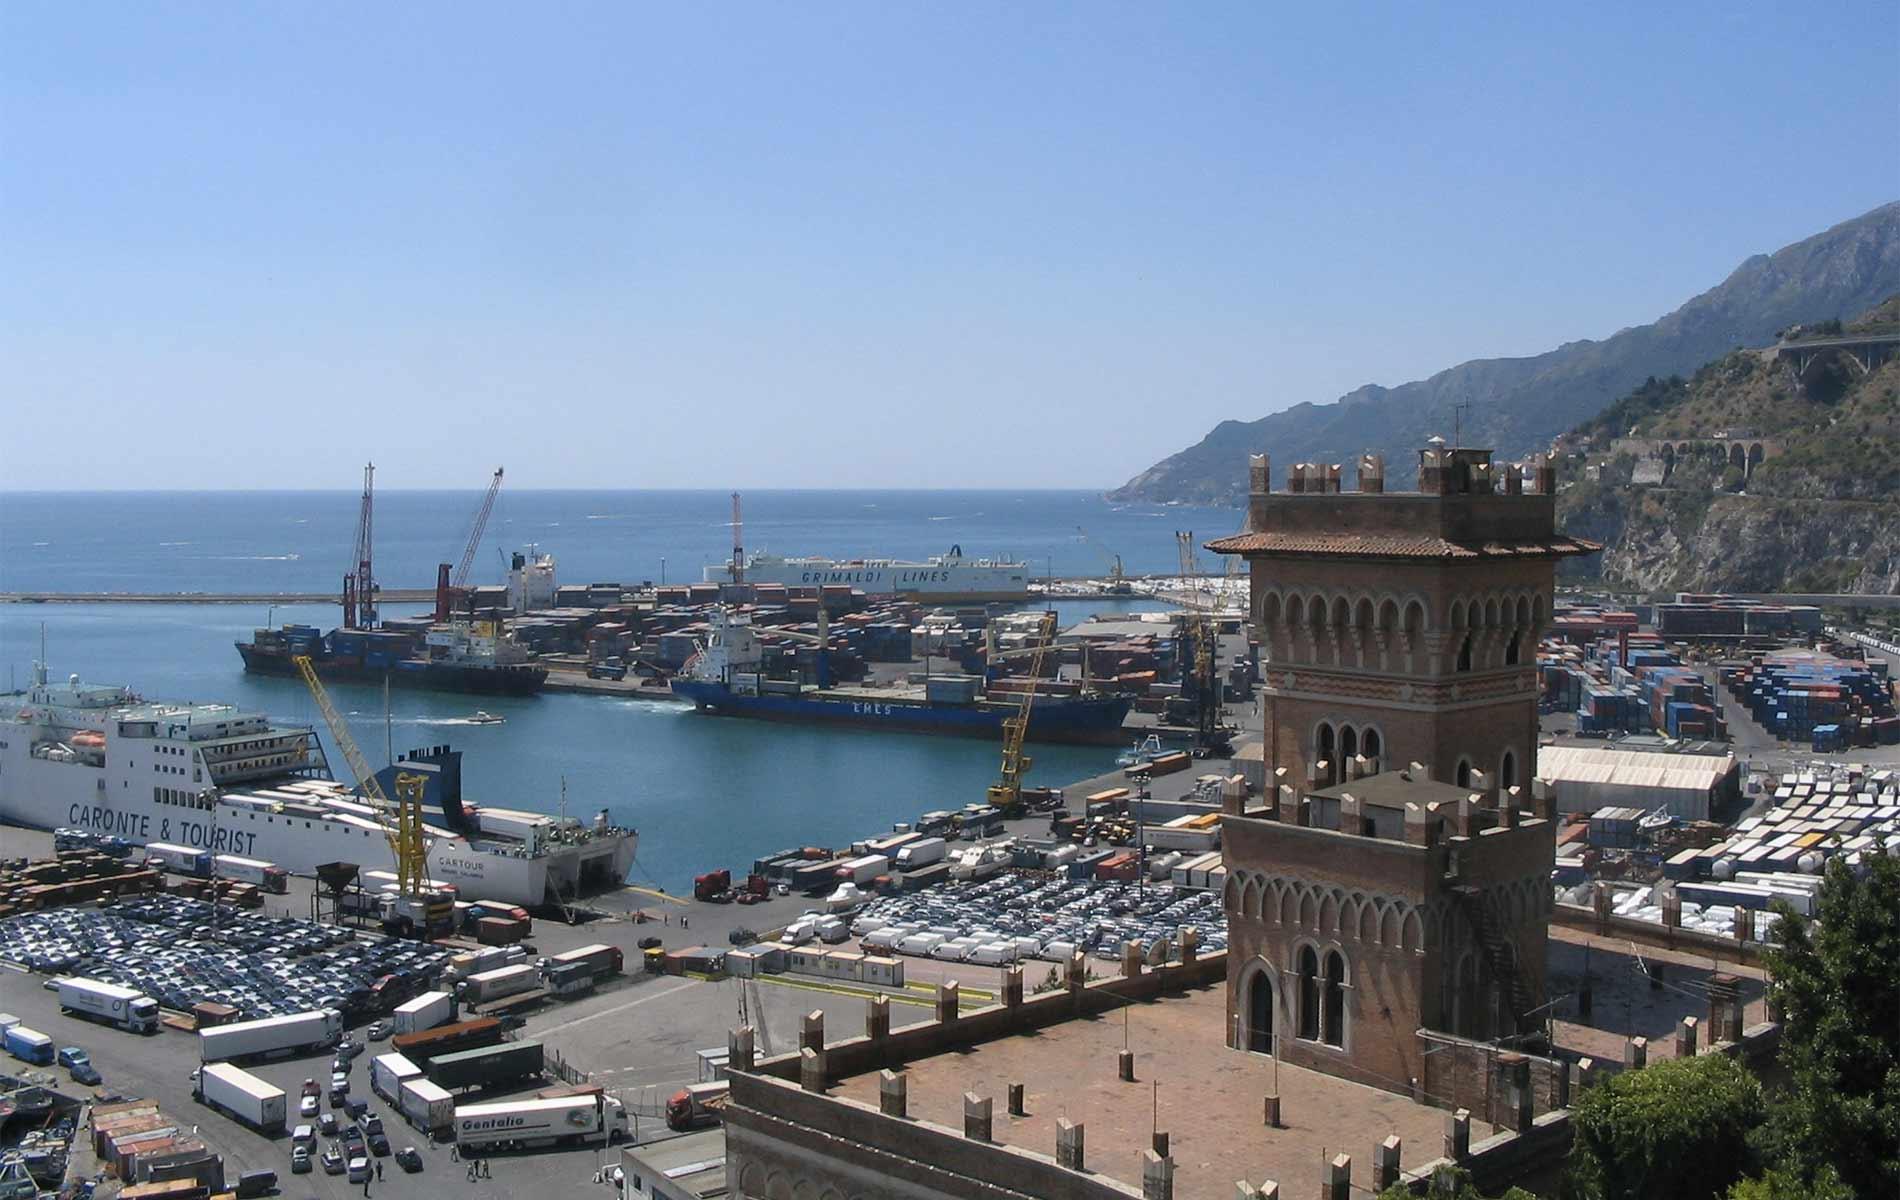 Porti crociere Salerno